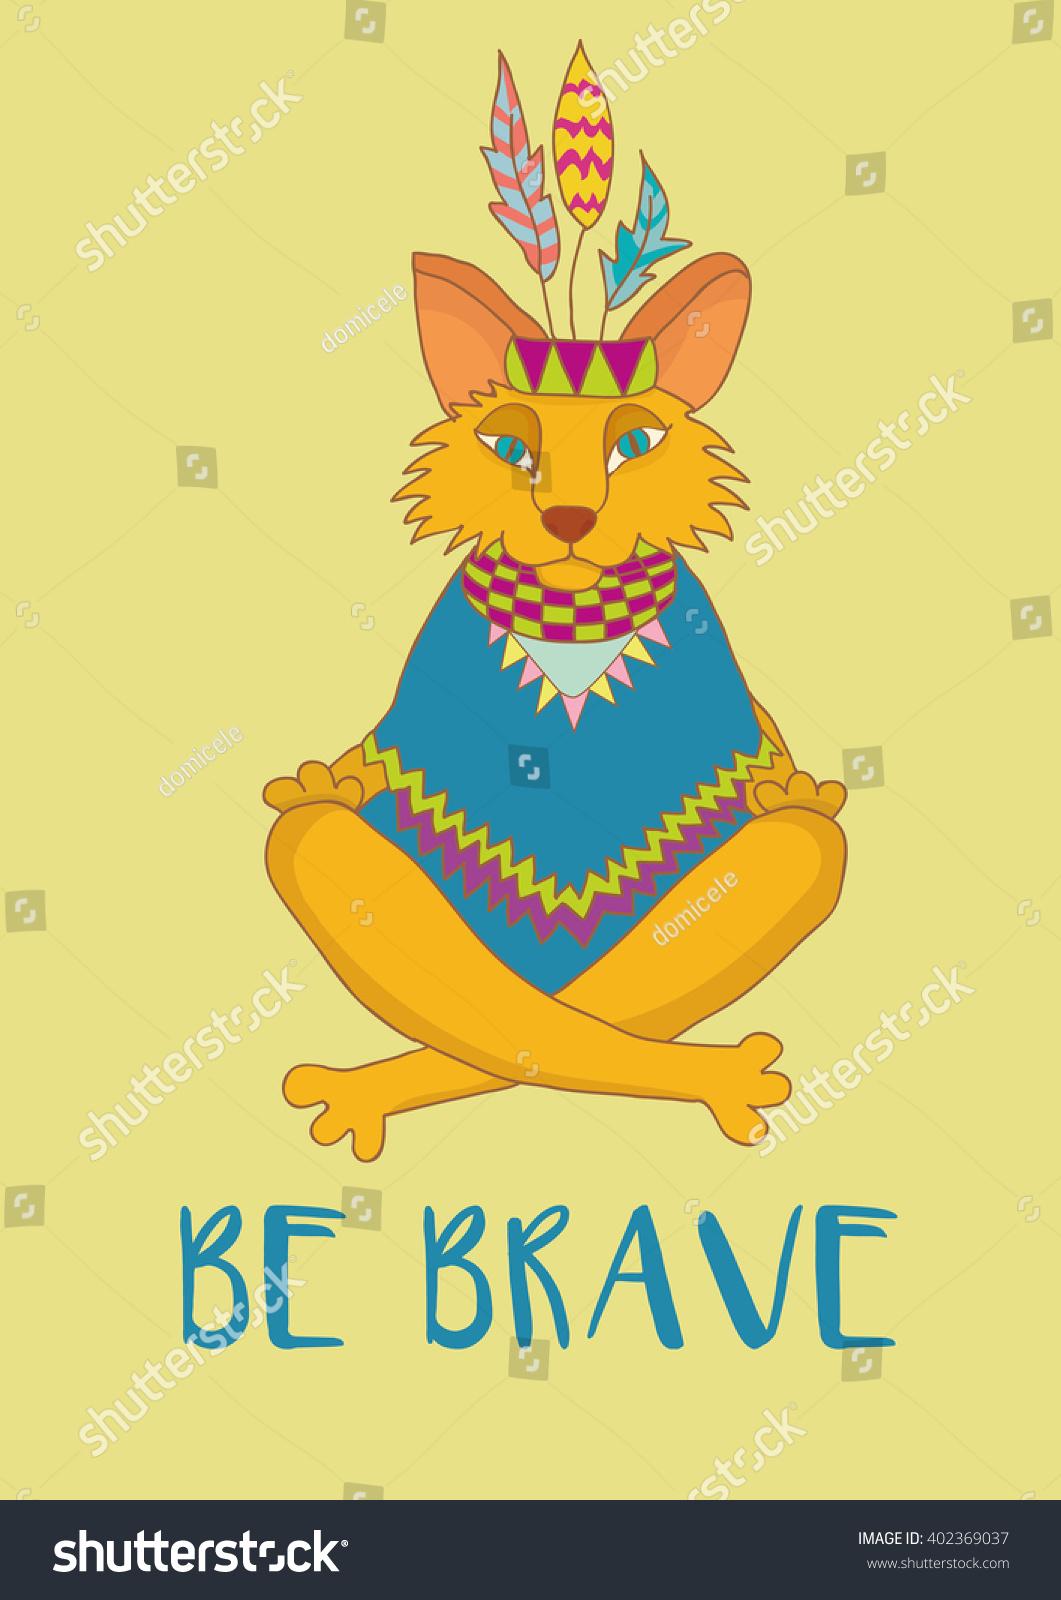 Be Brave Tribal Fox Print Nursery Stock Vector 402369037 - Shutterstock